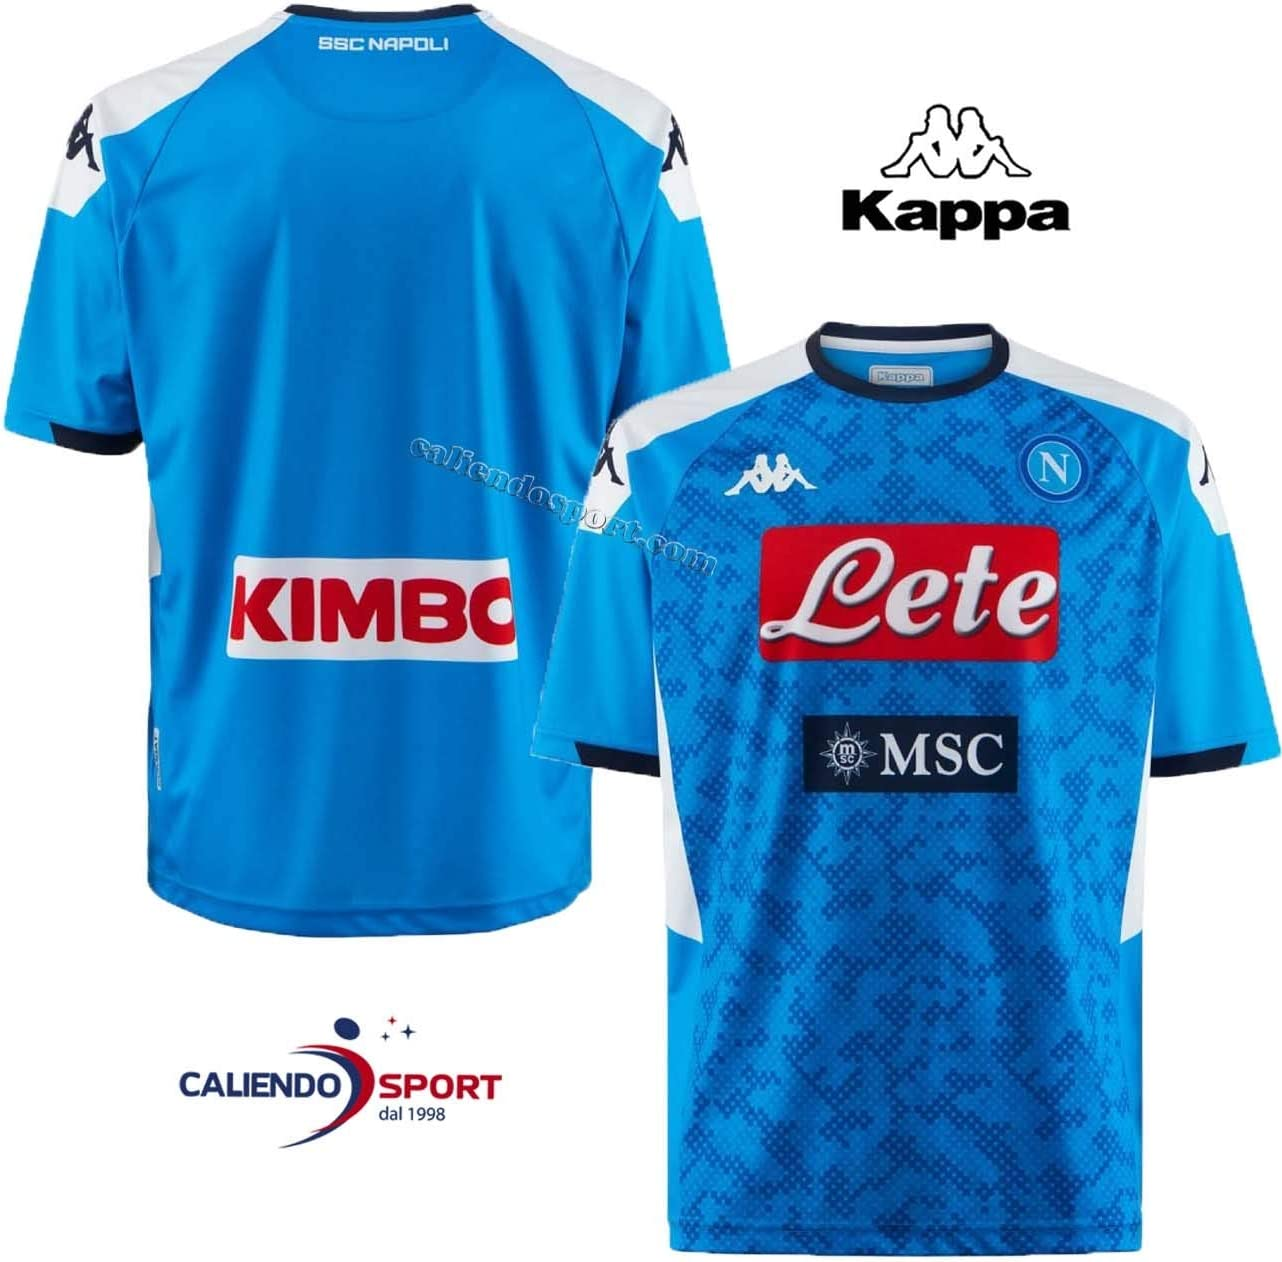 Kappa Maglia Replica Home 2019/2020 - Camiseta De Juego Hombre ...